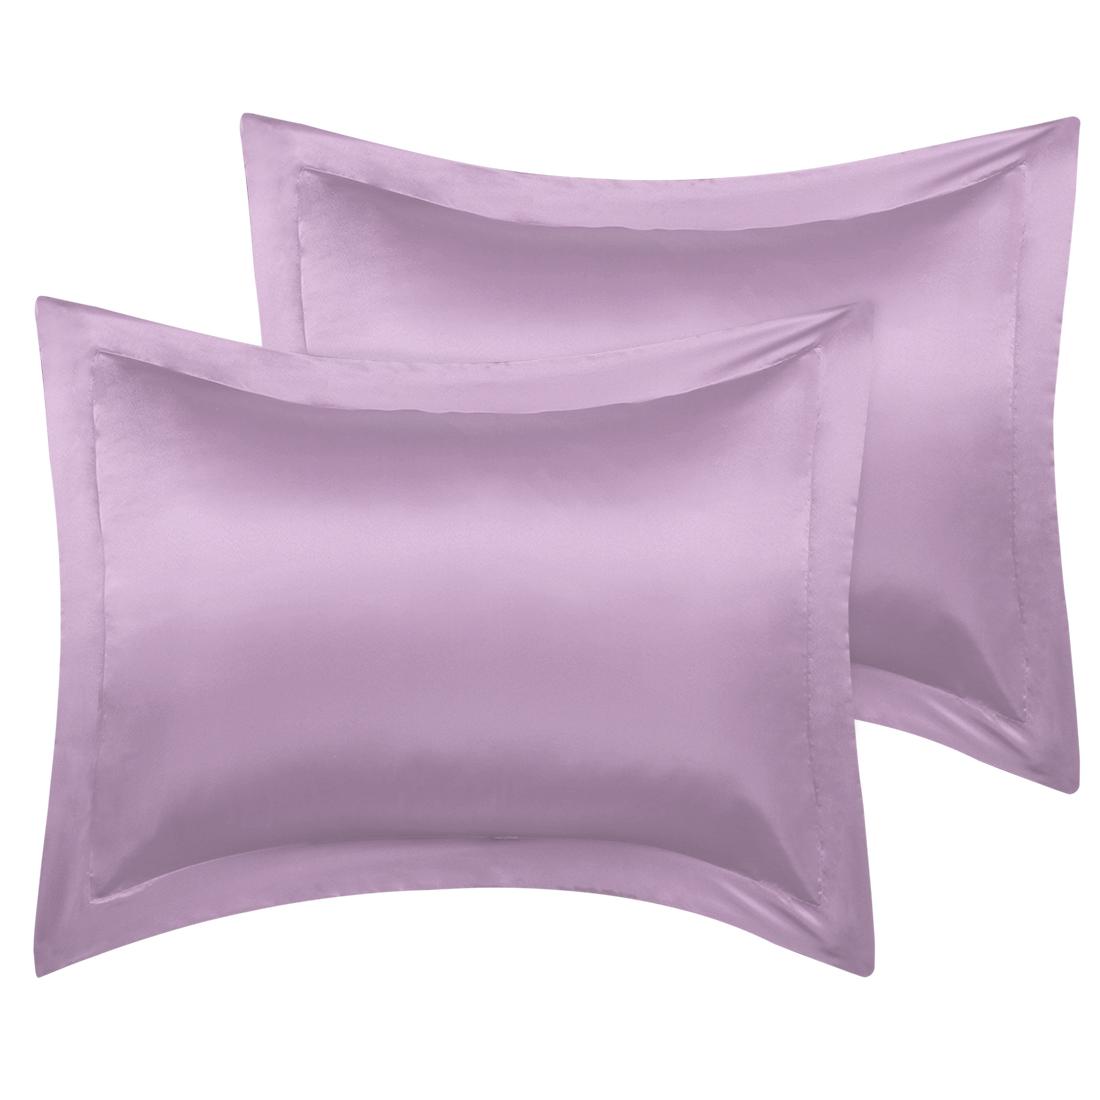 2 Pcs Mauve Pillow Shams Satin Pillow Cases King Oxford Pillowcases